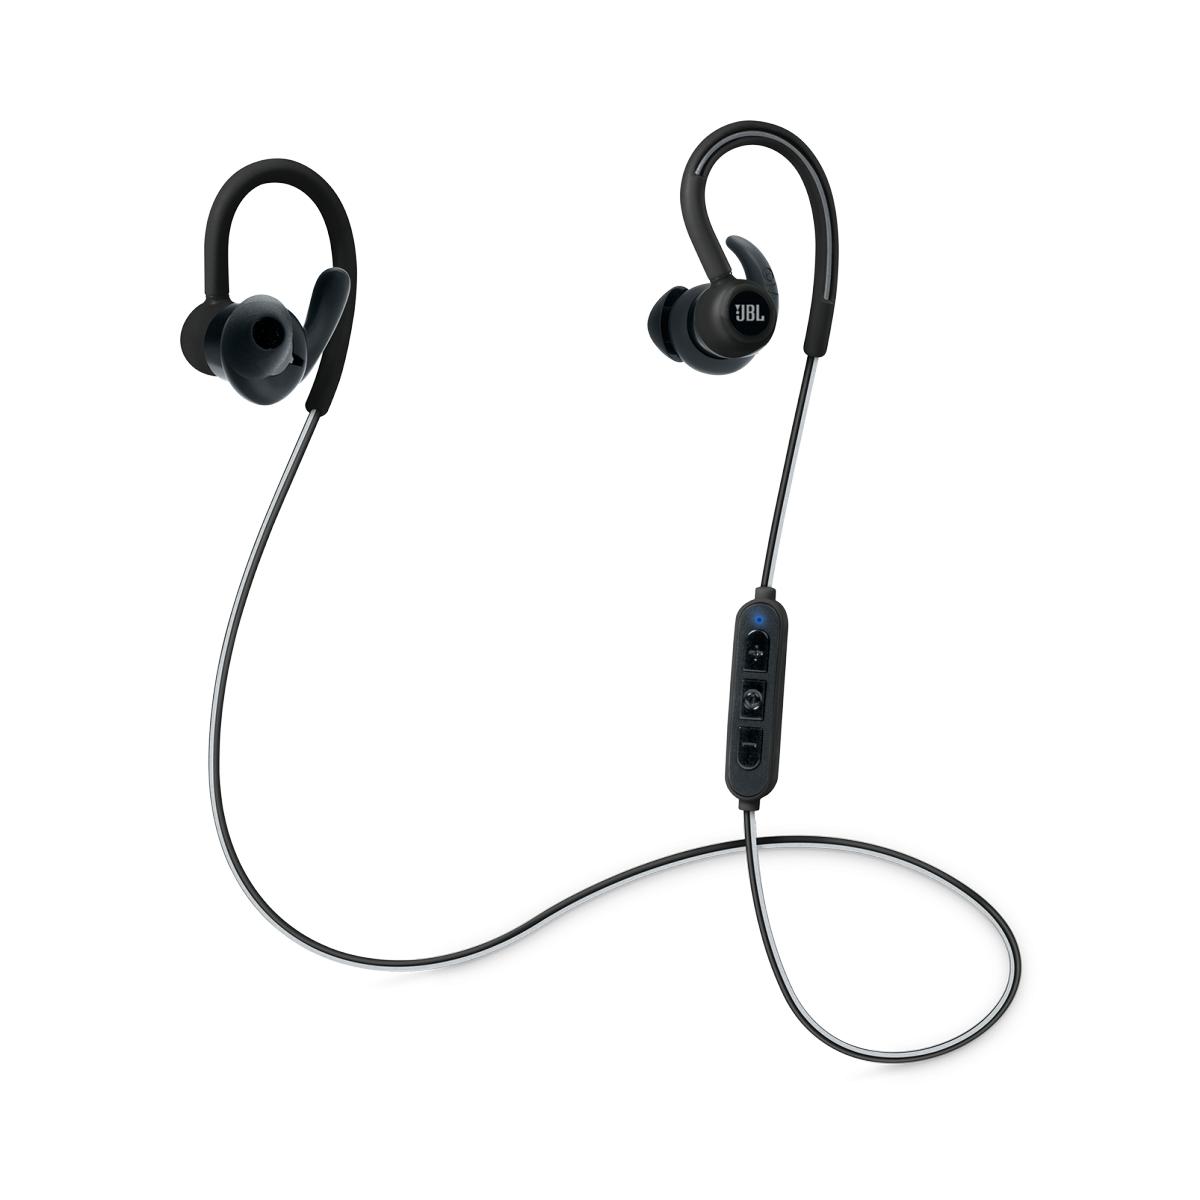 7547ab557ff JBL Reflect Contour Wireless Headphones Price in Pakistan | Buy JBL Wireless  Sport Headphones Black | iShopping.pk